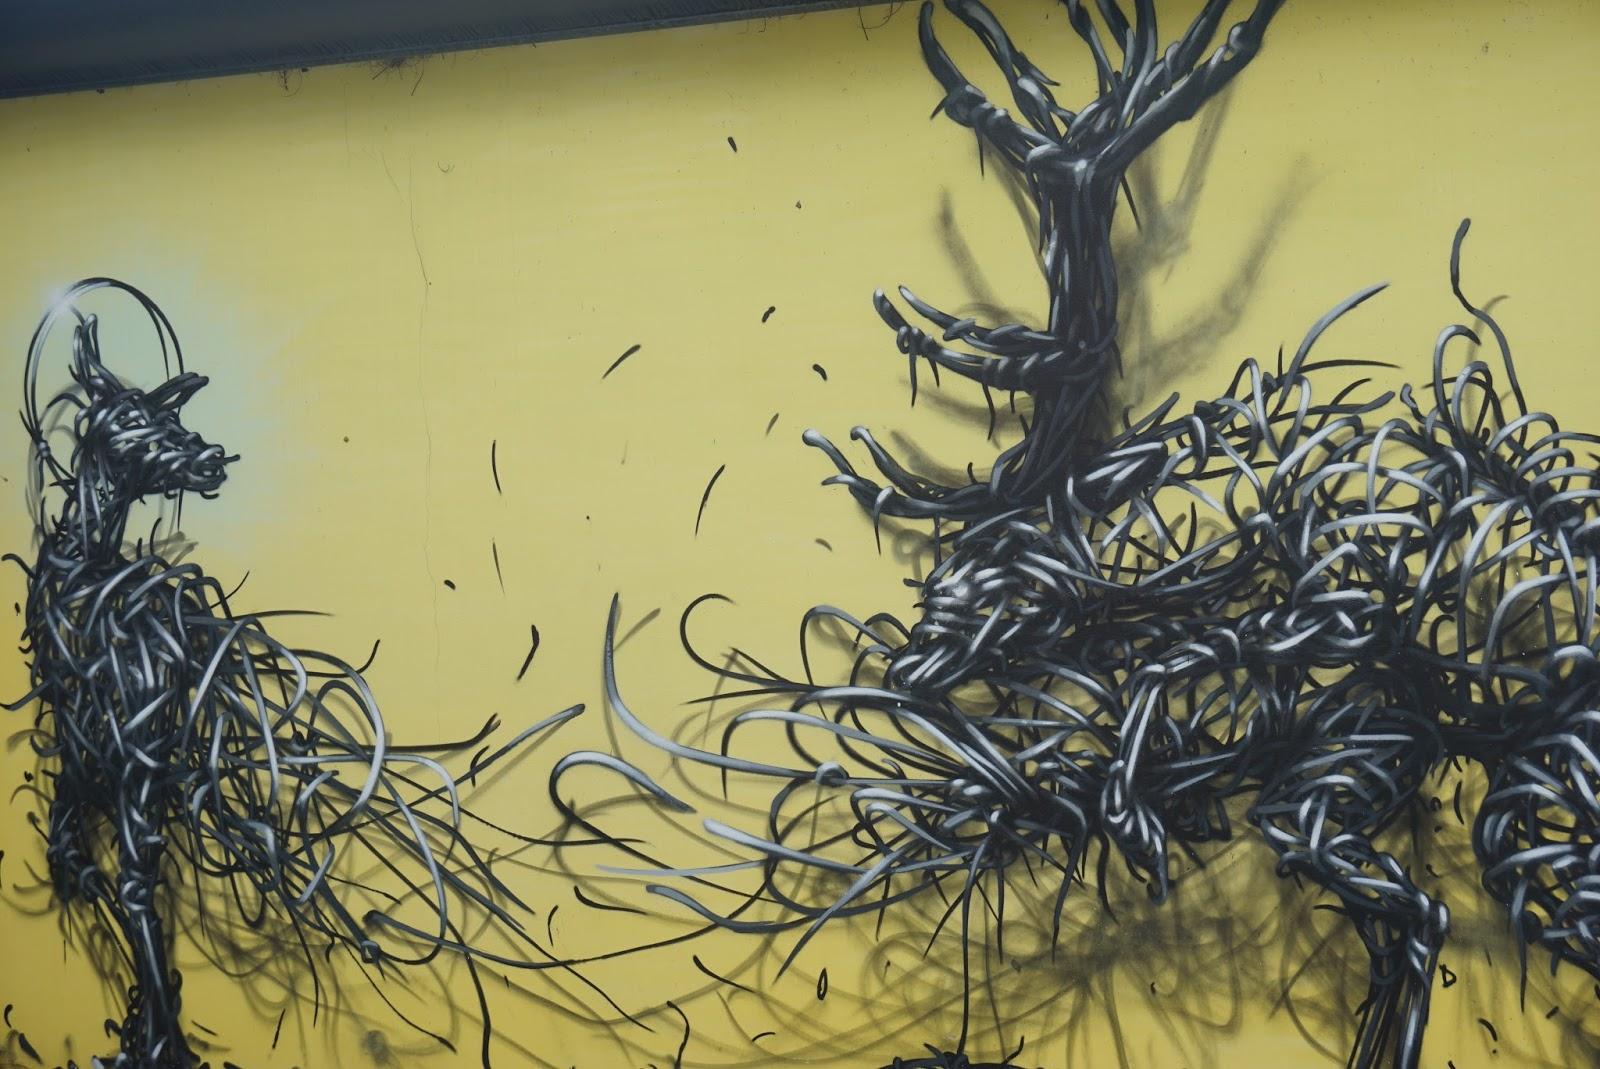 The Wynwood Walls - The Crown Wings